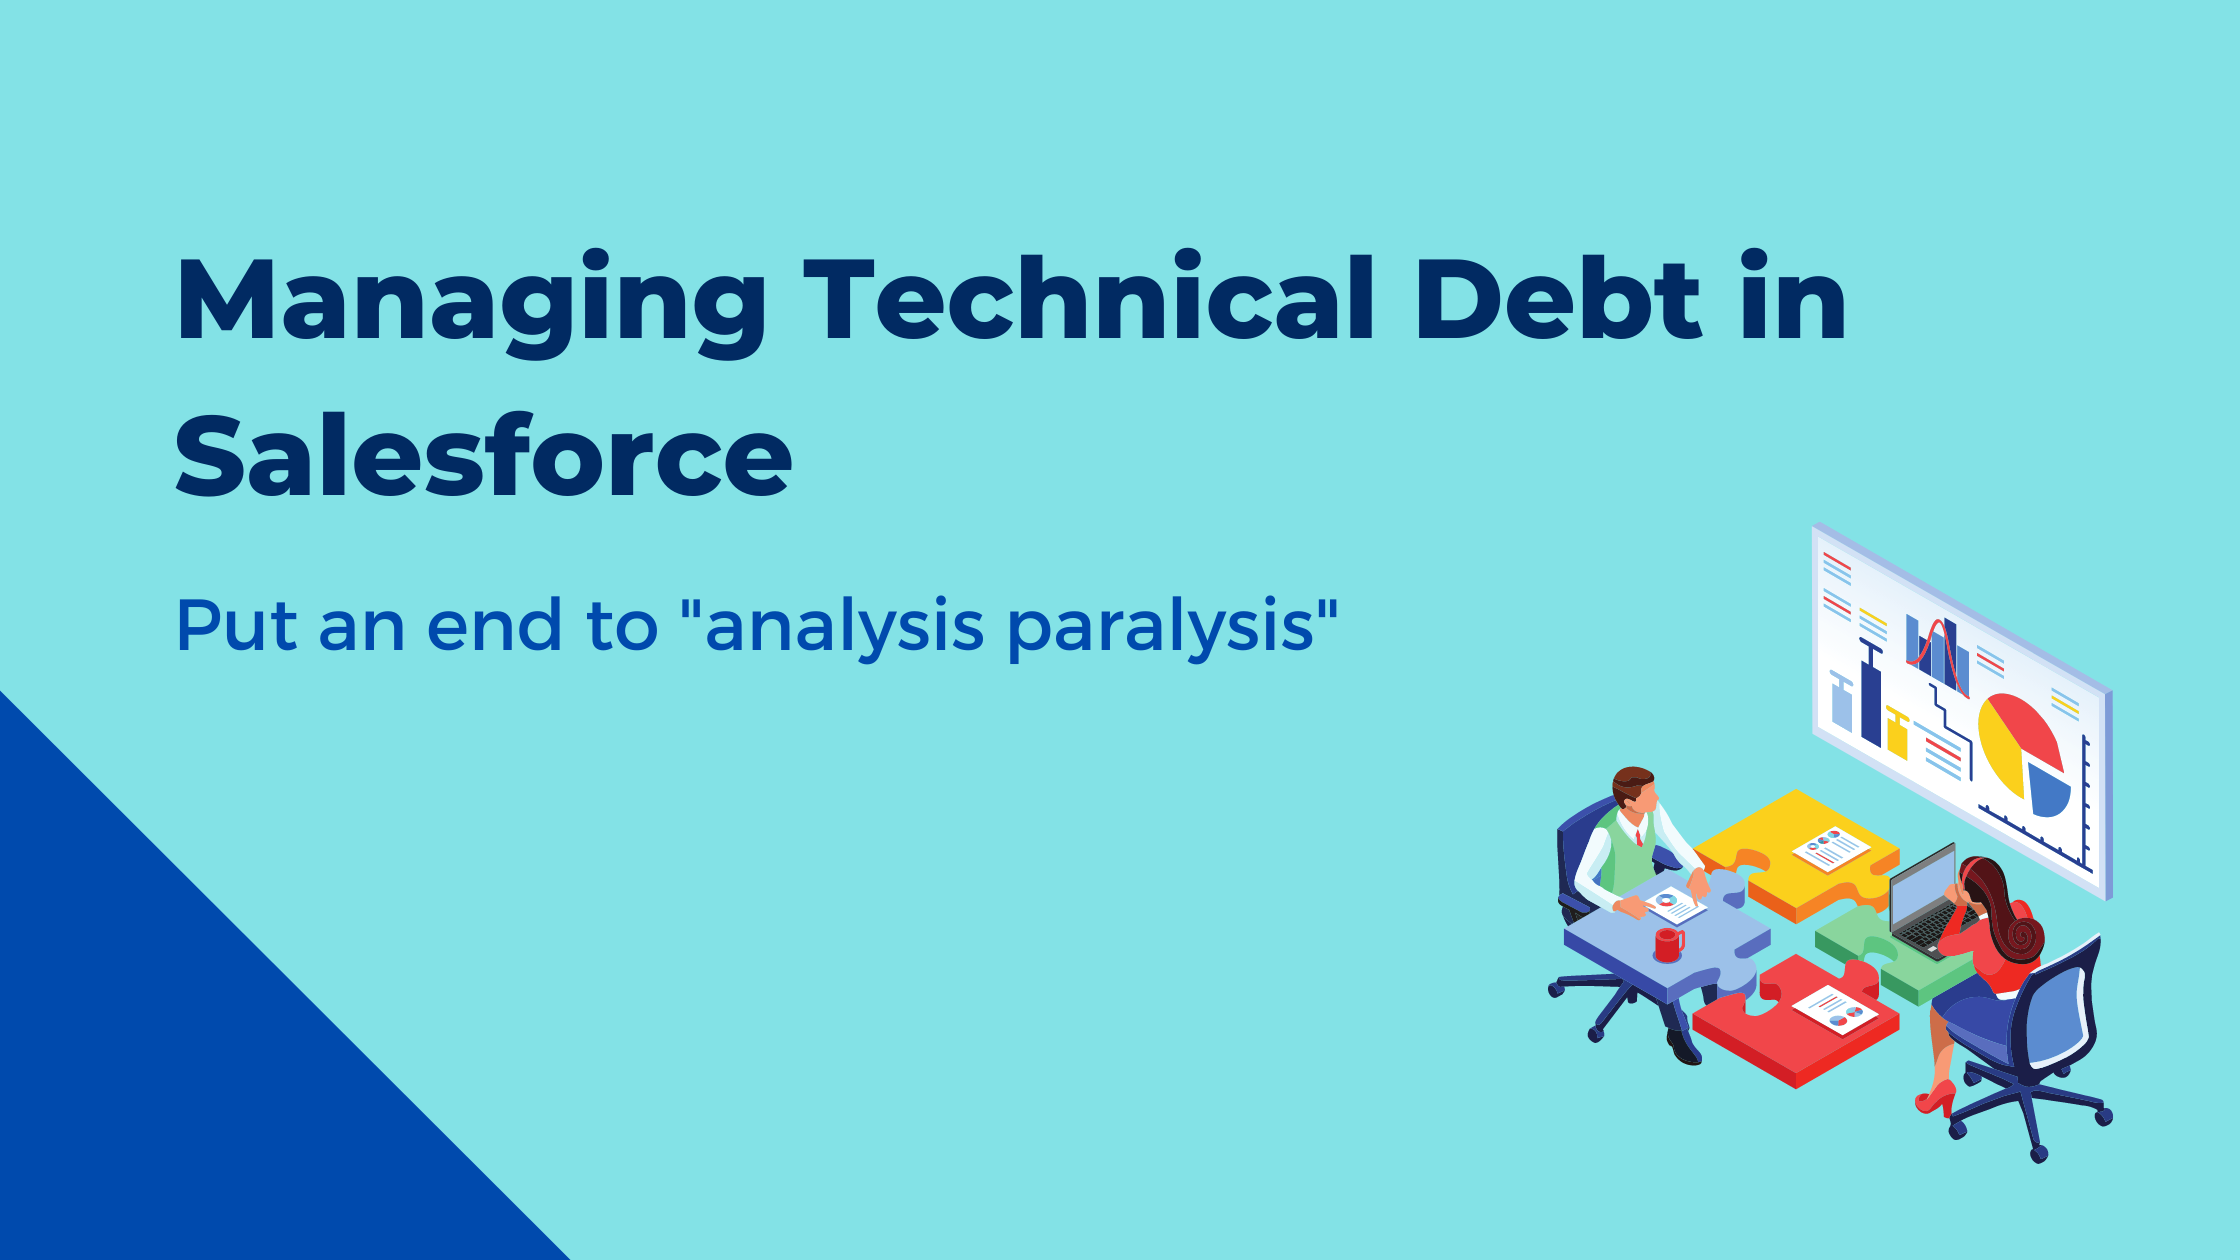 salesforce Technical Debt